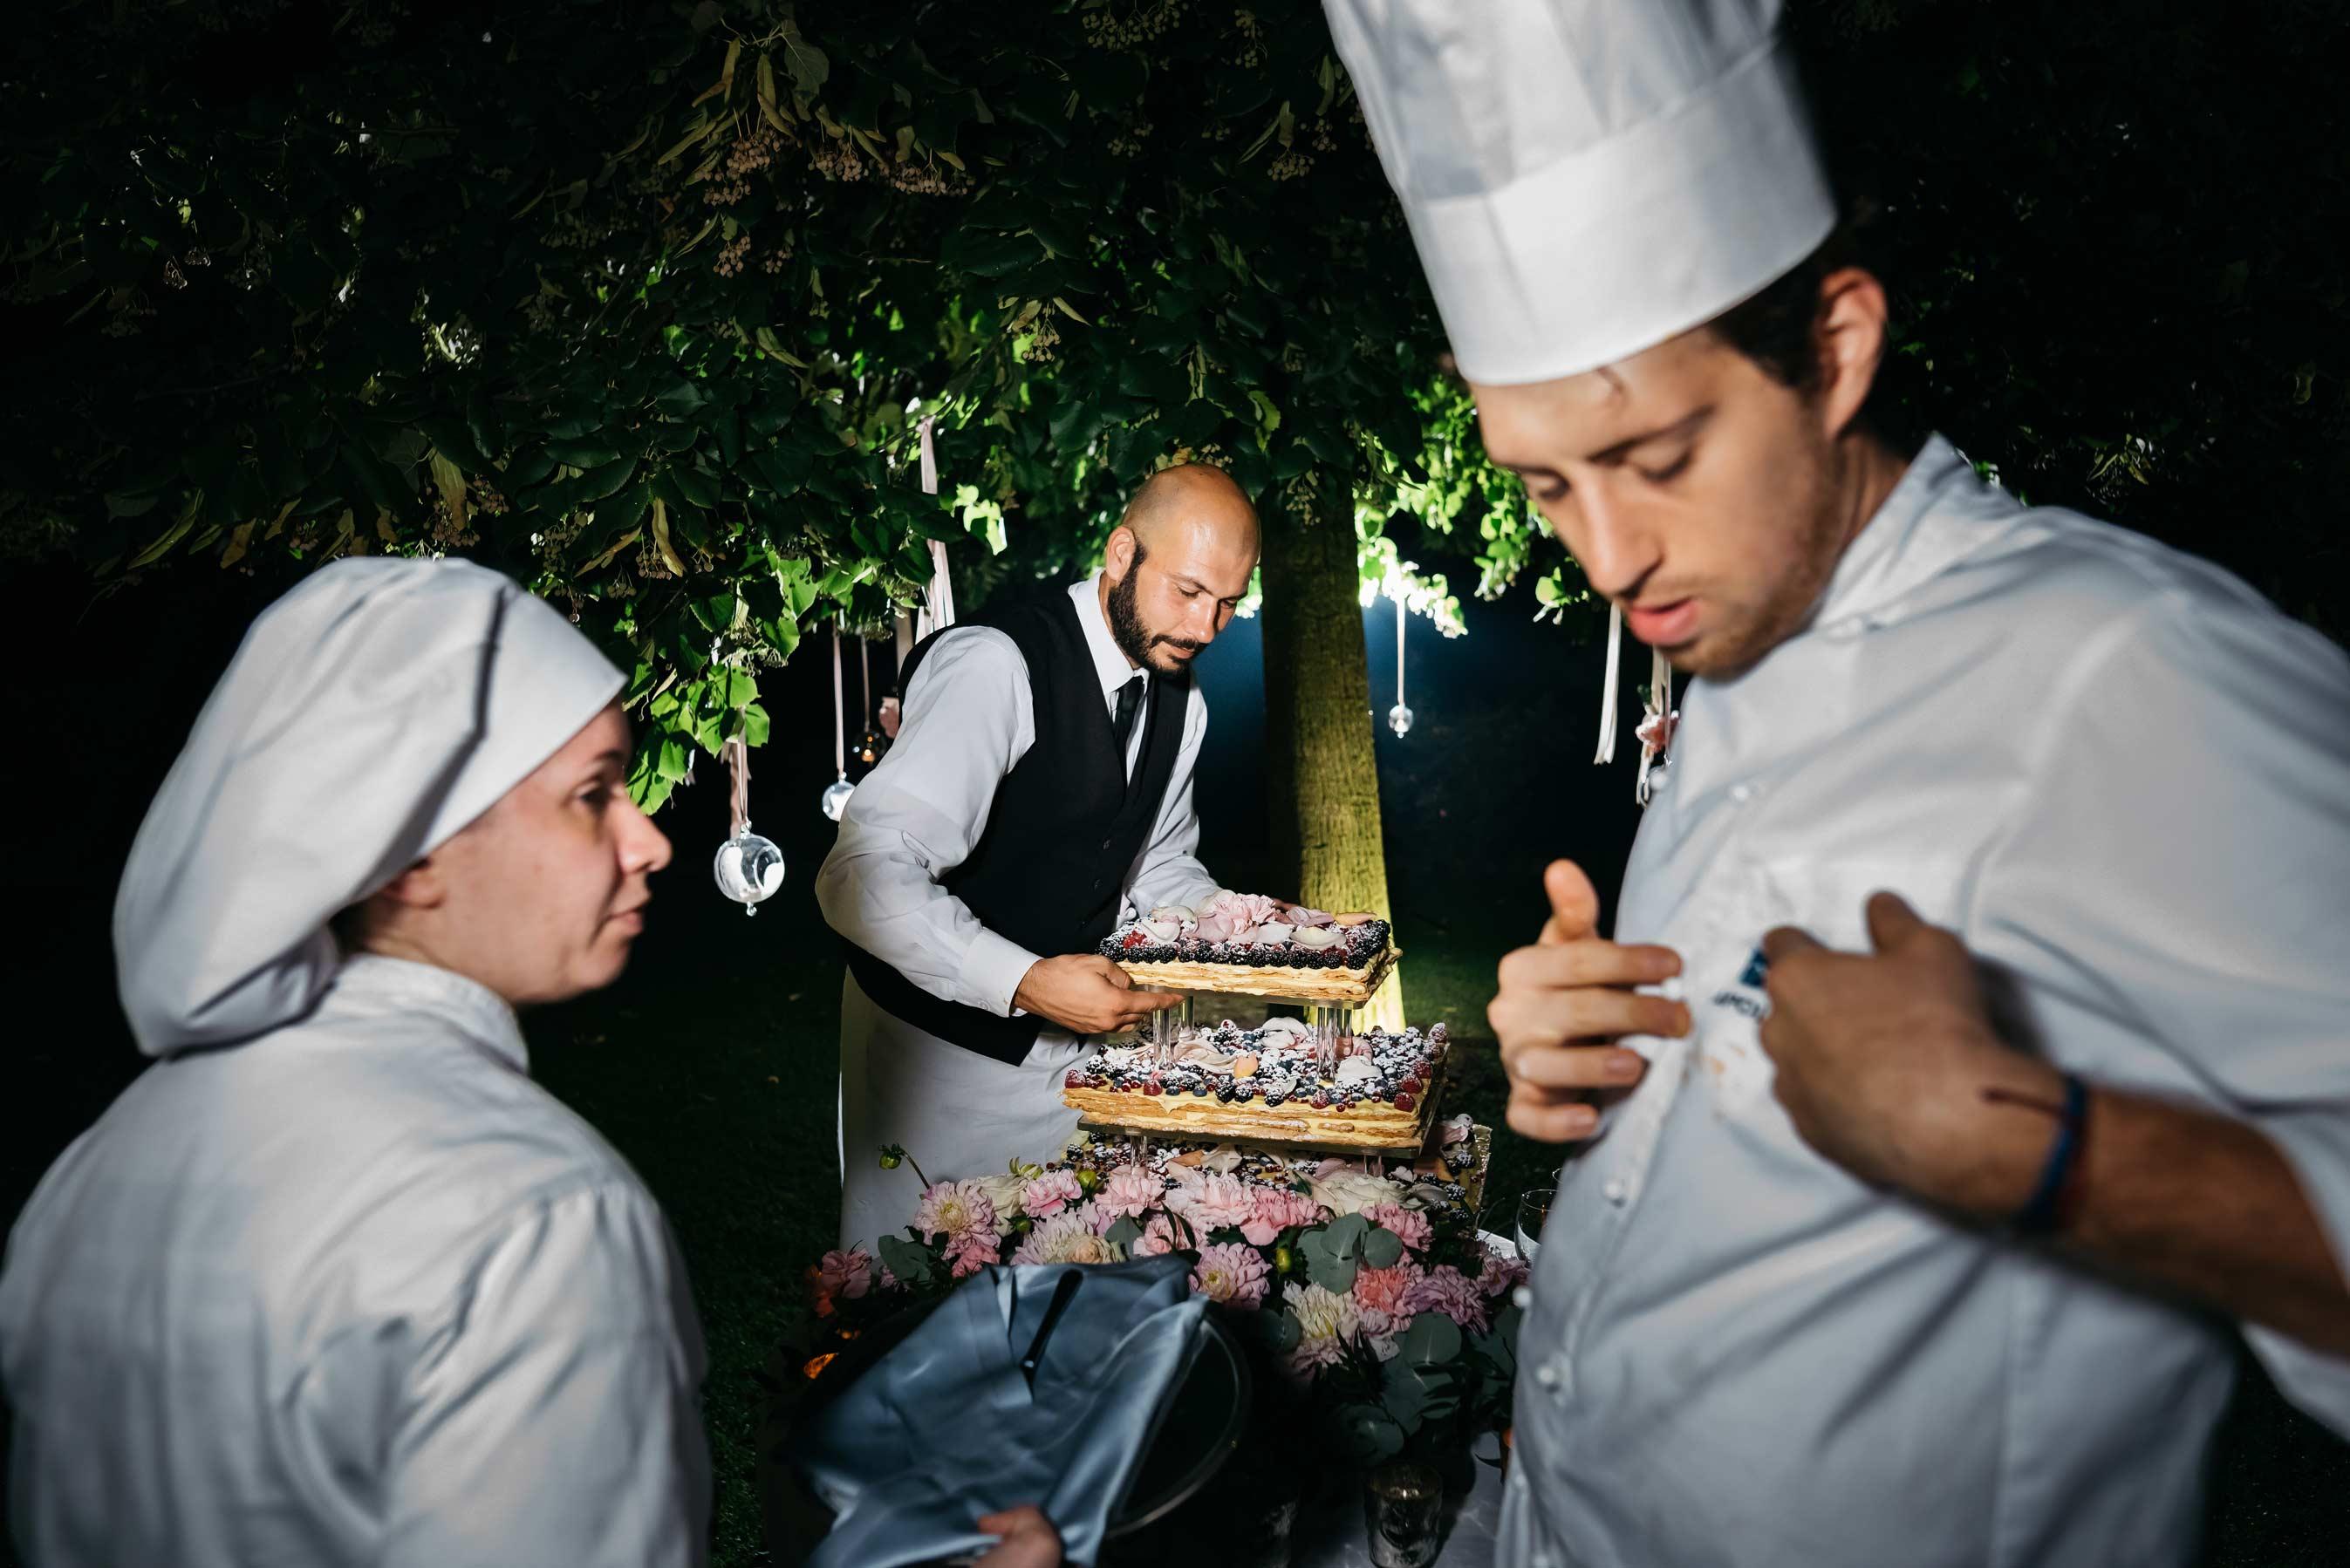 Fotografo-Matrimonio-Stile-Reportage-Roma-Ricevimento